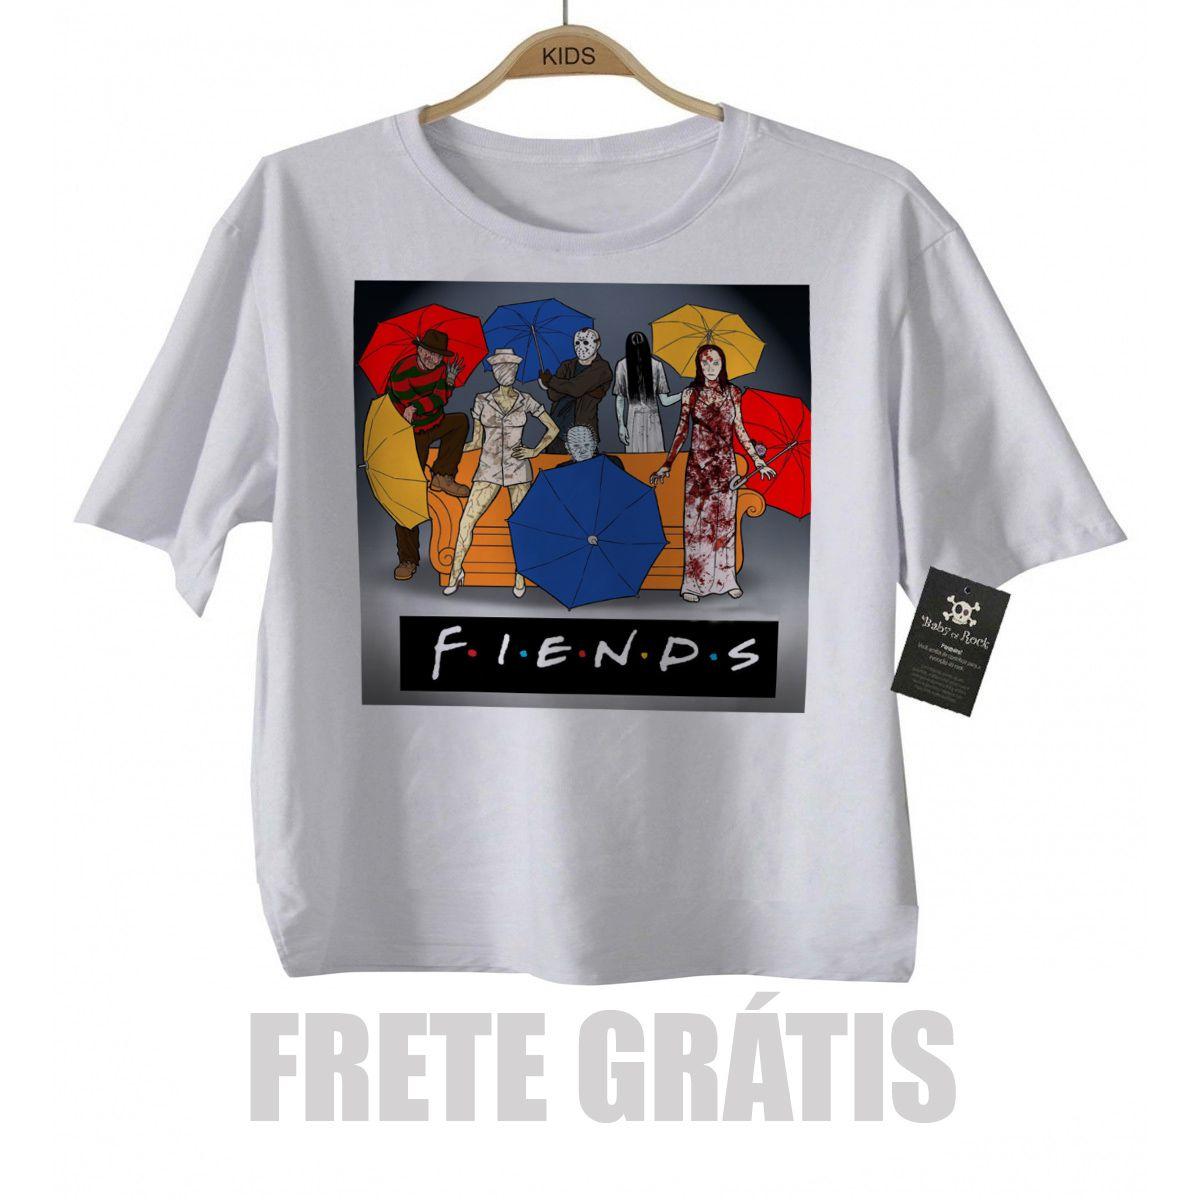 Camiseta Infantil - Seriado | Friends | Terror  - Baby Monster - Body Bebe